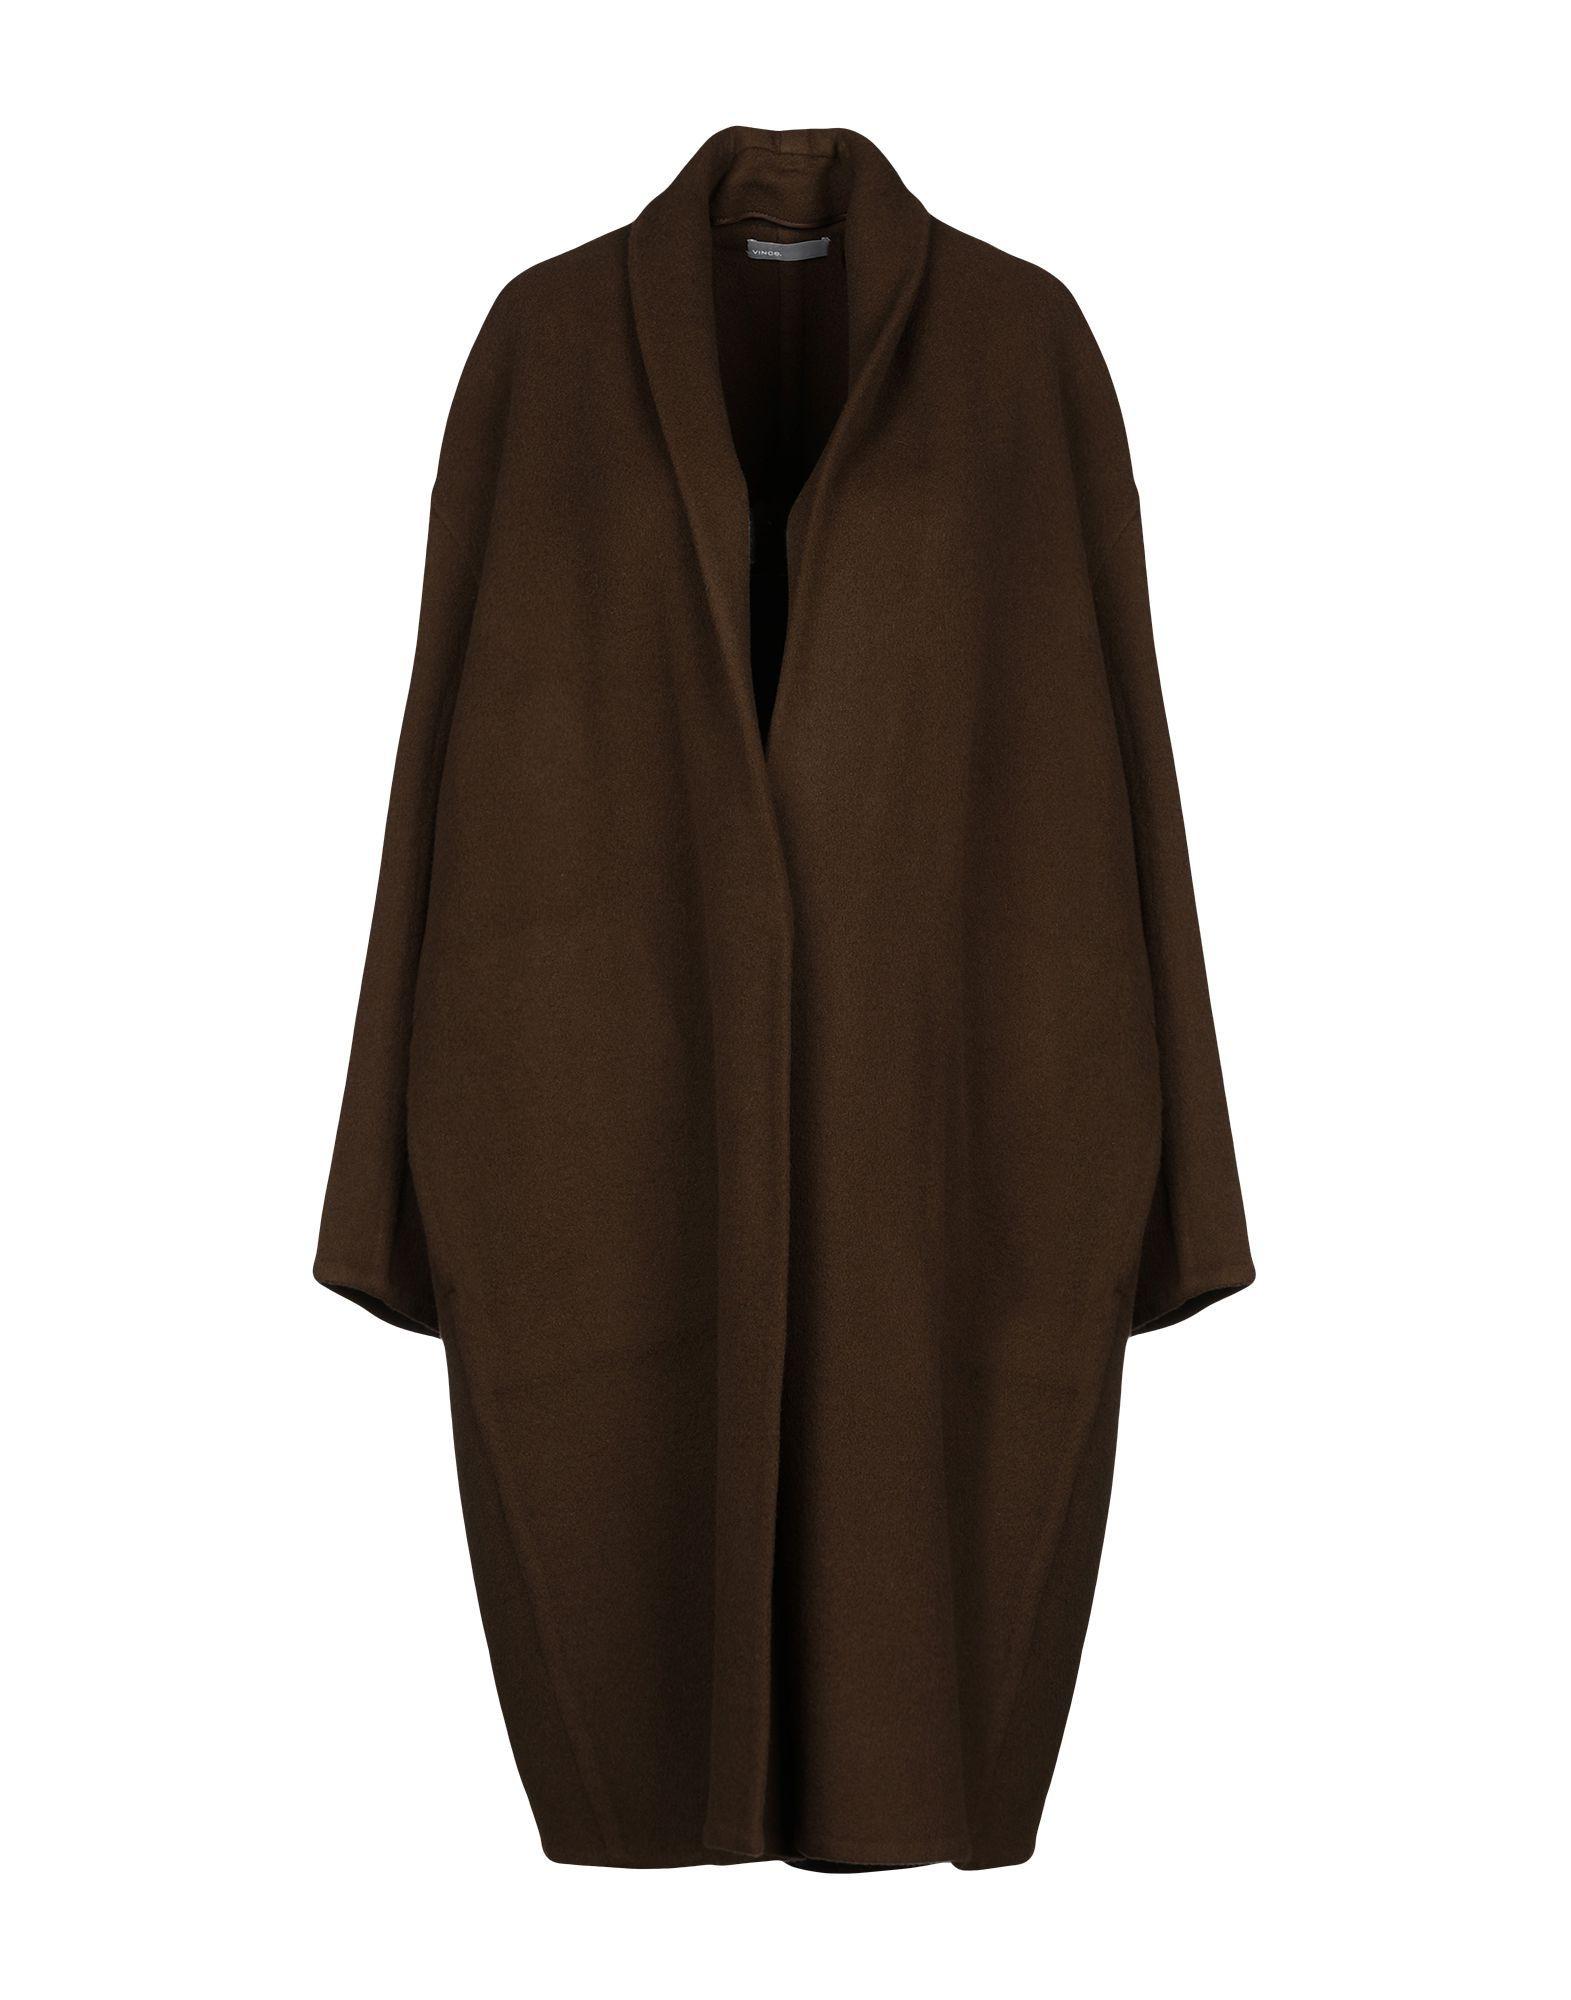 Vince. Military Green Wool Overcoat